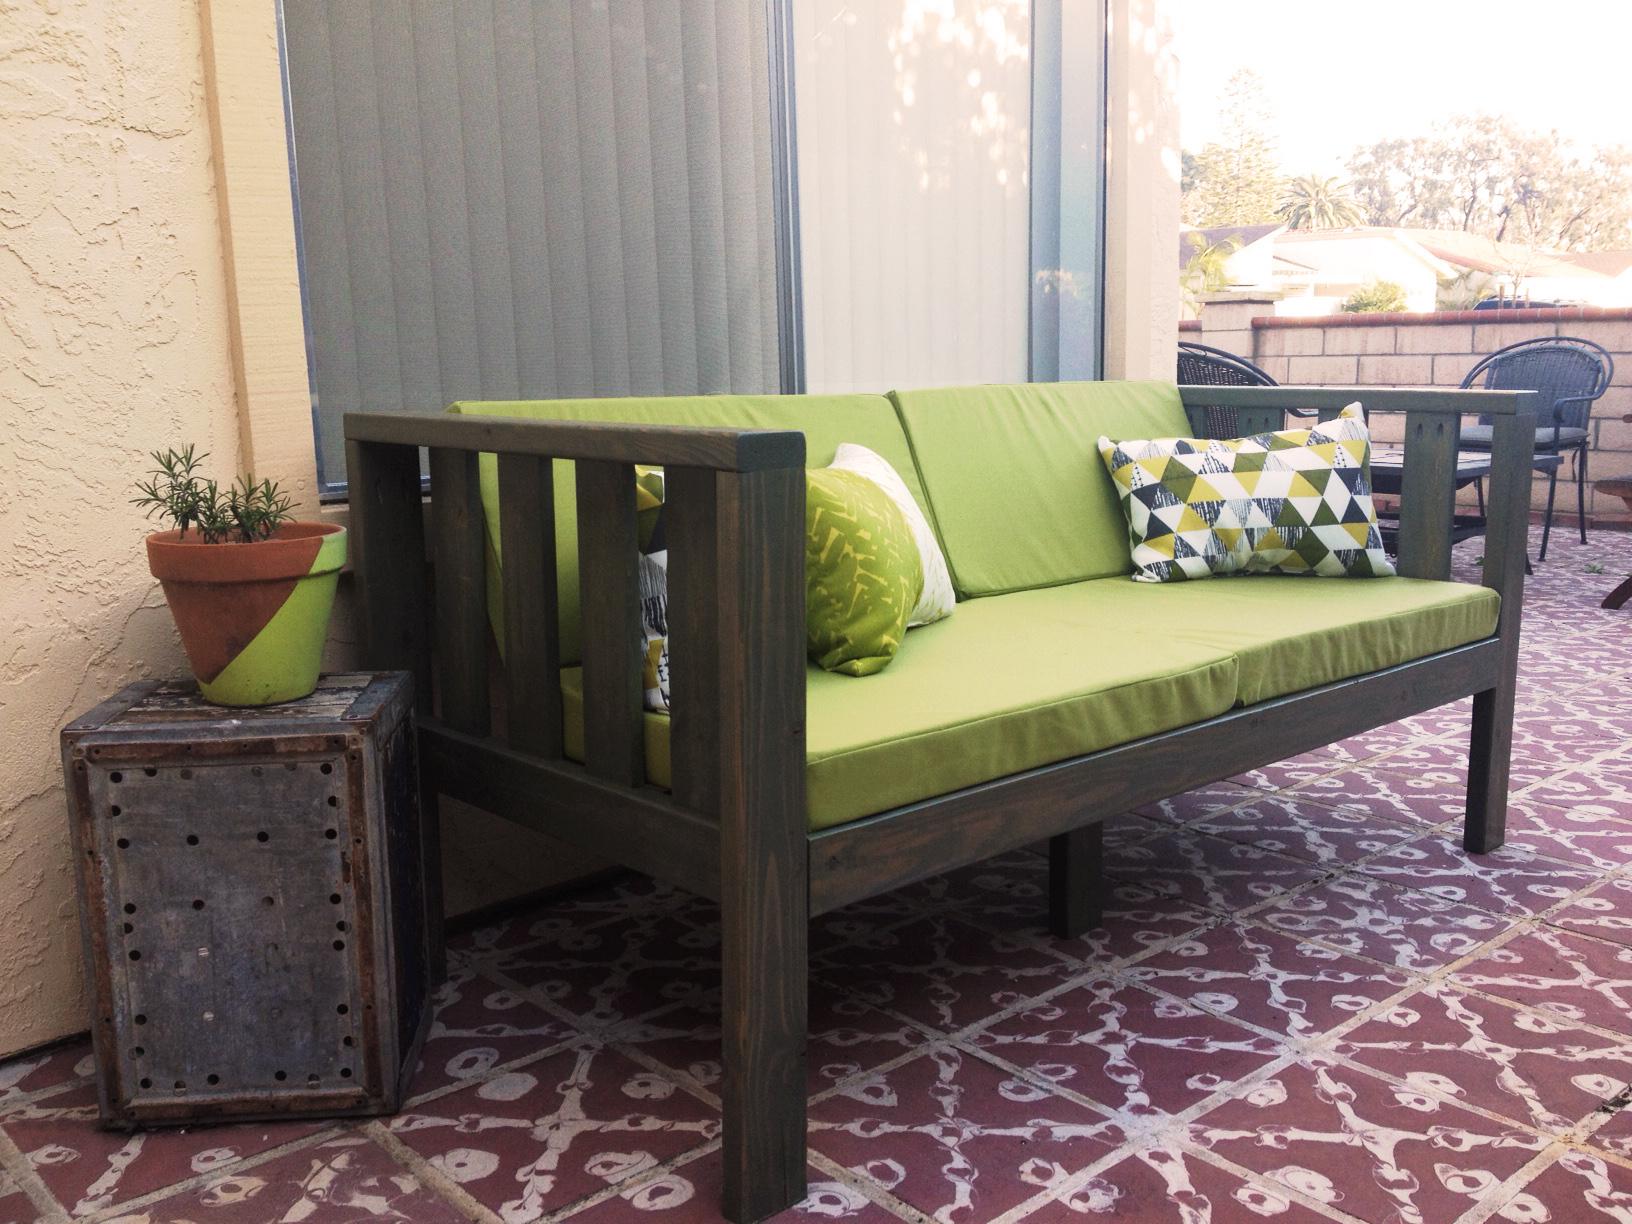 Diy diy patio furniture cushions pdf download bun feet wood diy diy patio furniture cushions pdf download bun feet wood tacit11rtxdc solutioingenieria Images